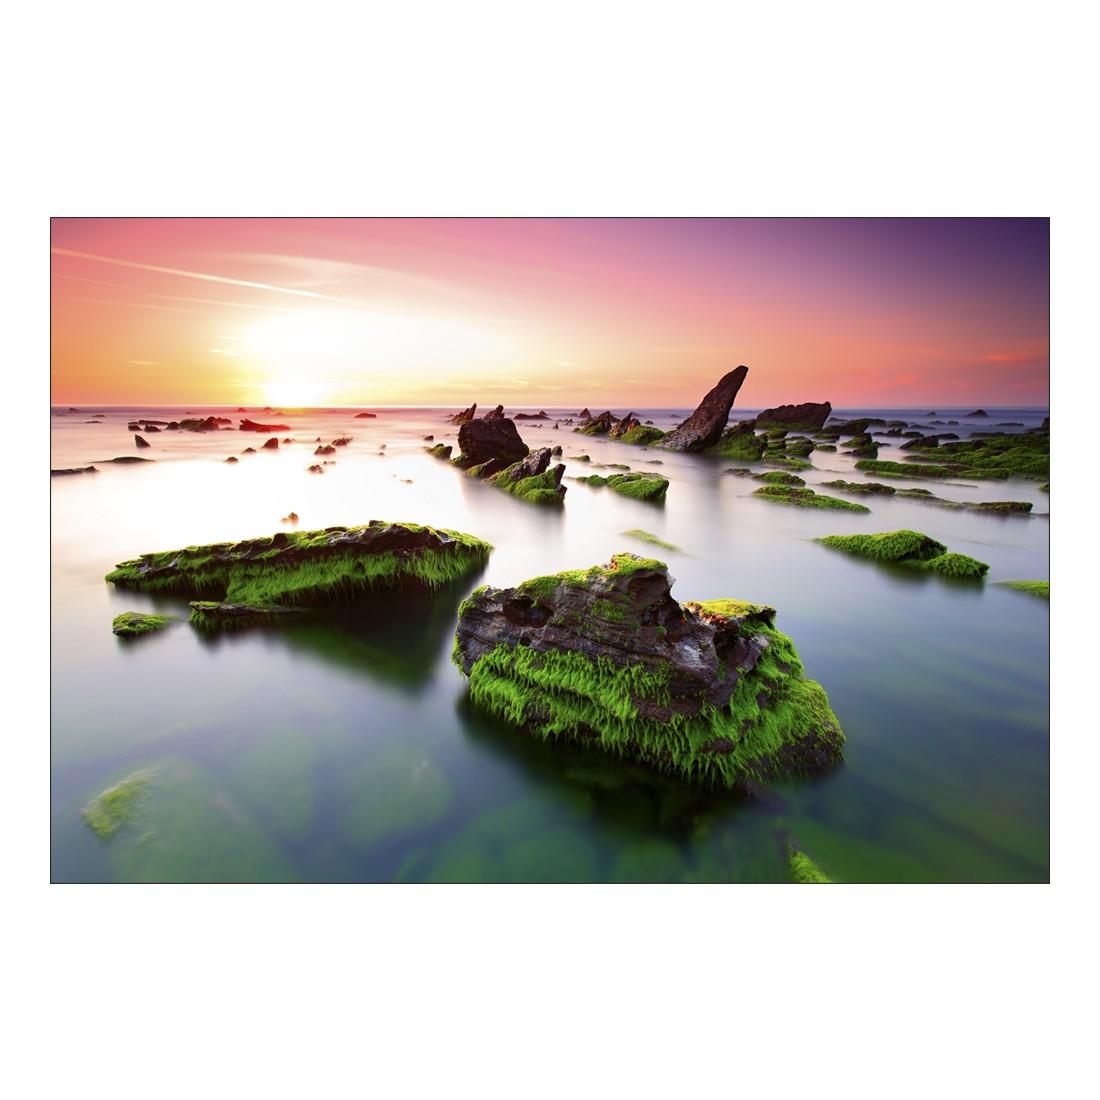 Acrylglasbild Impressive Sea View – Abmessung 75×50 cm, Gallery of Innovative Art günstig